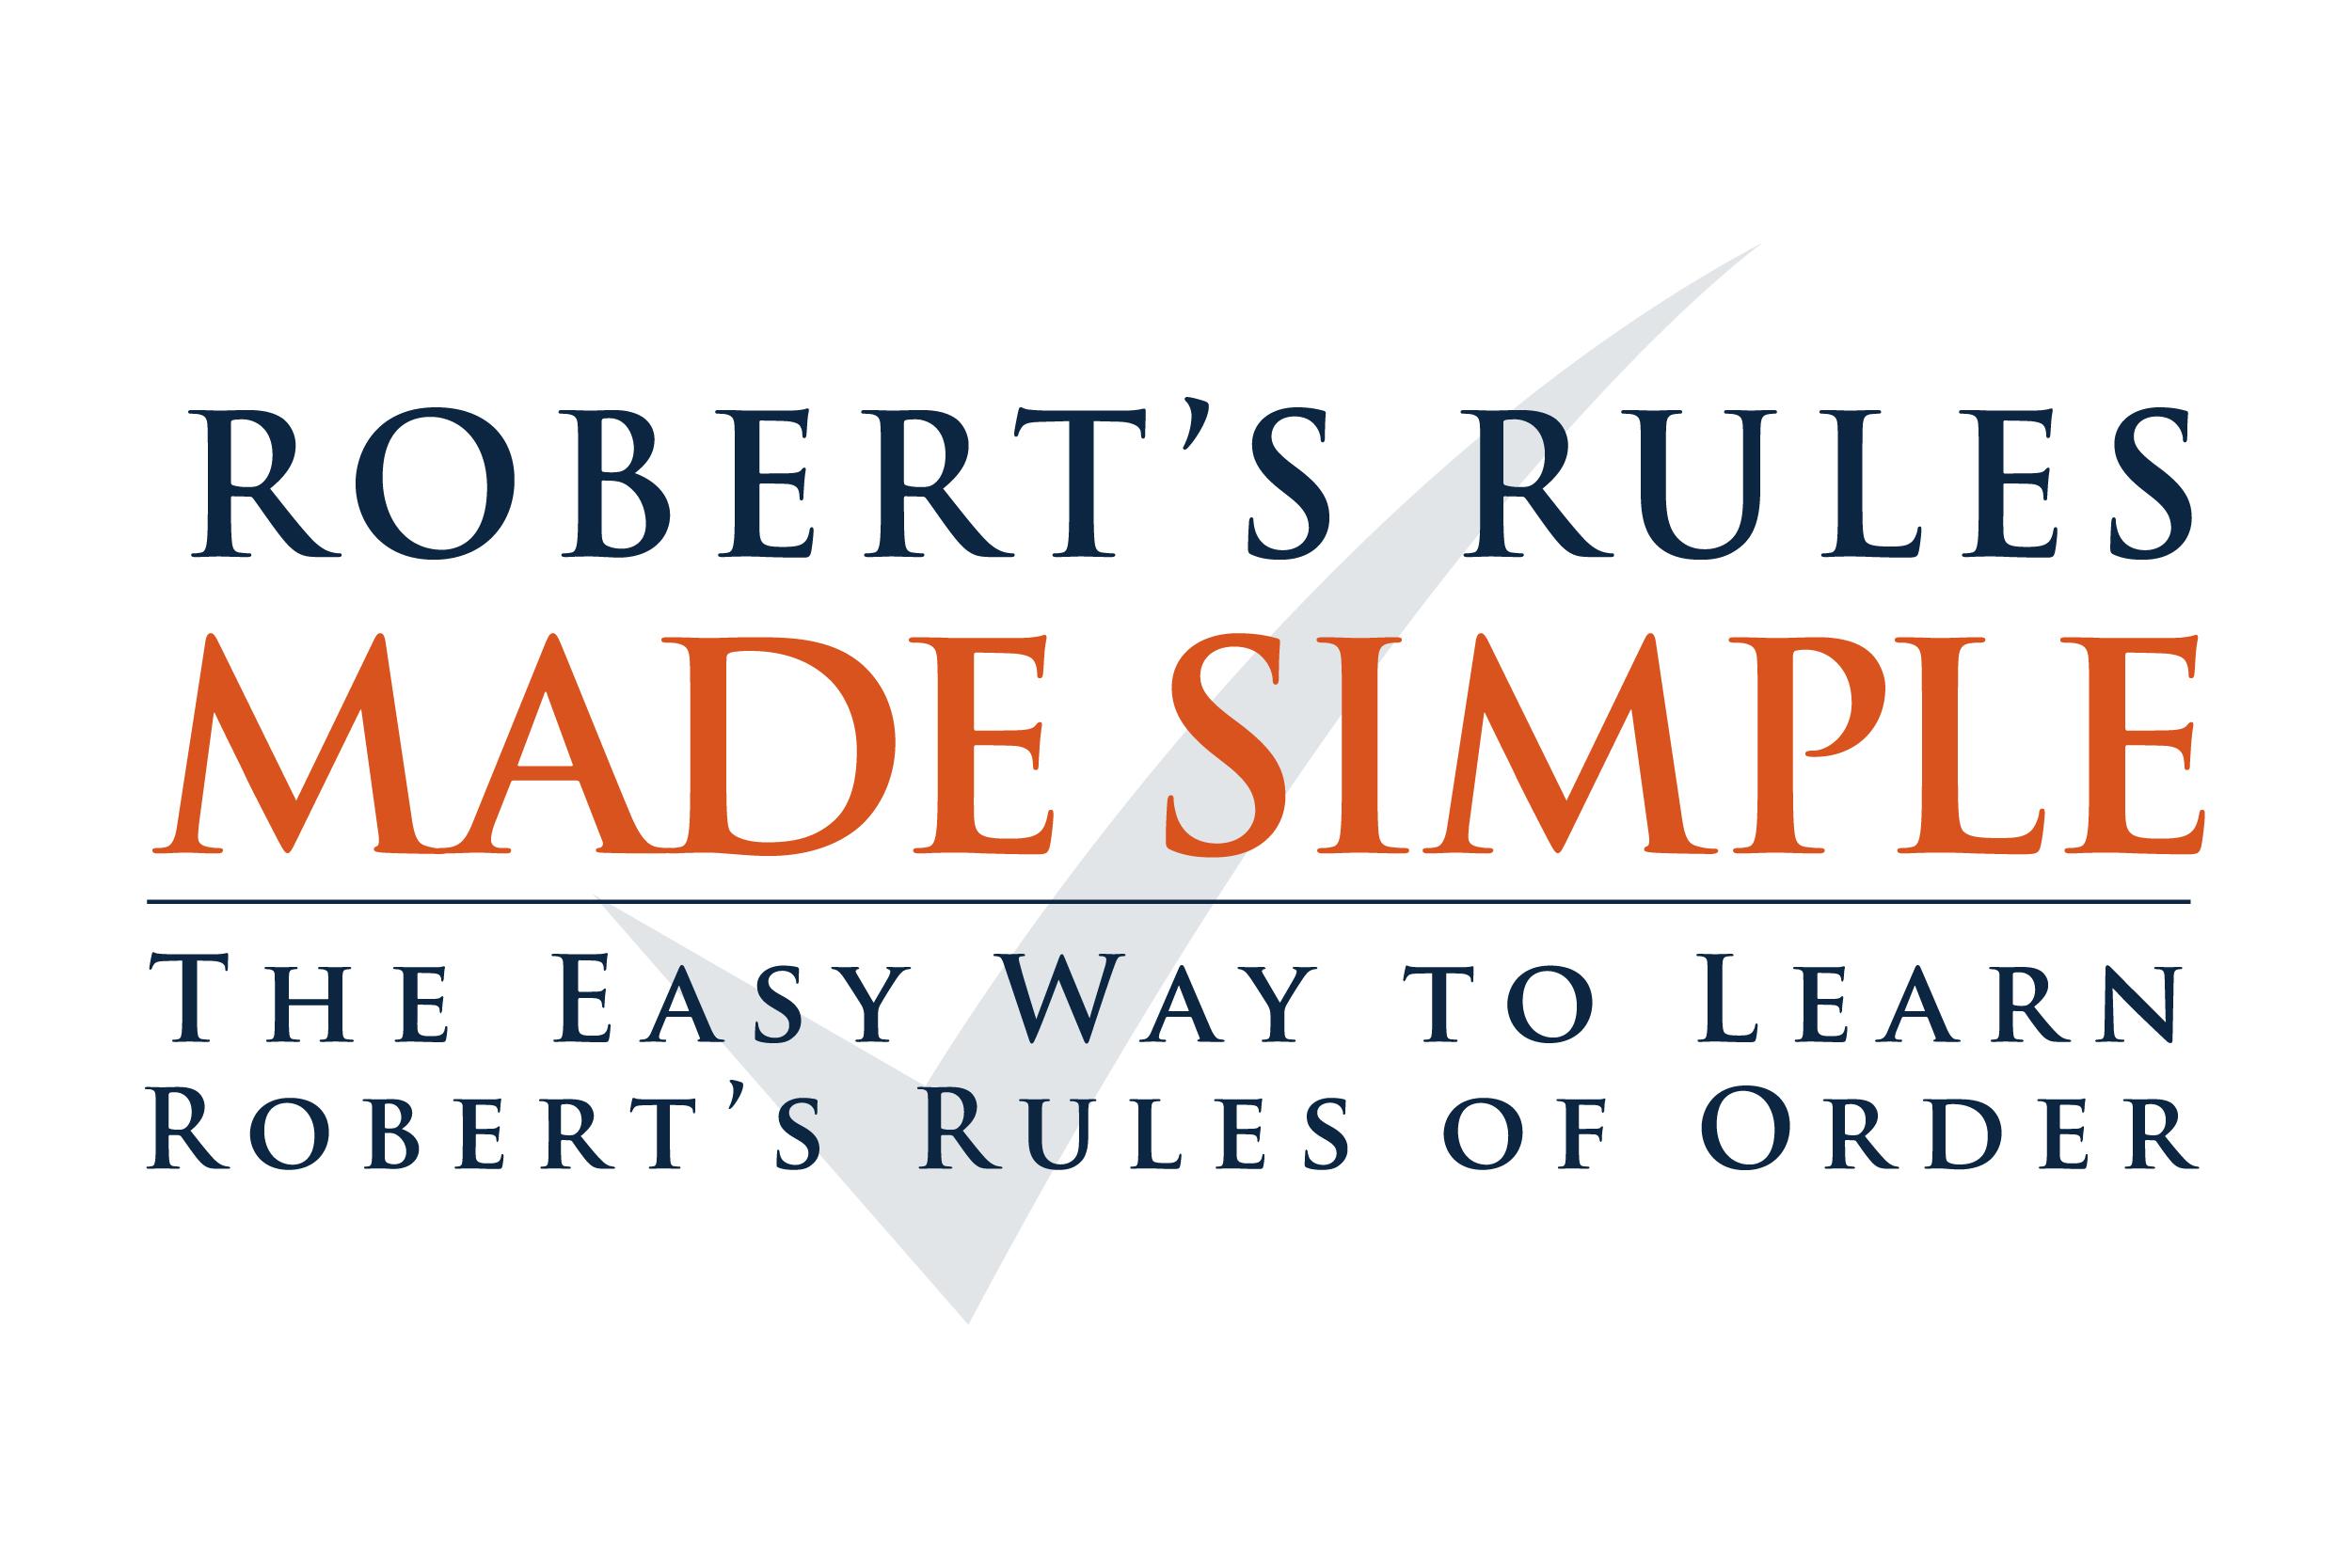 RobertsRulesMadeSimple.jpg